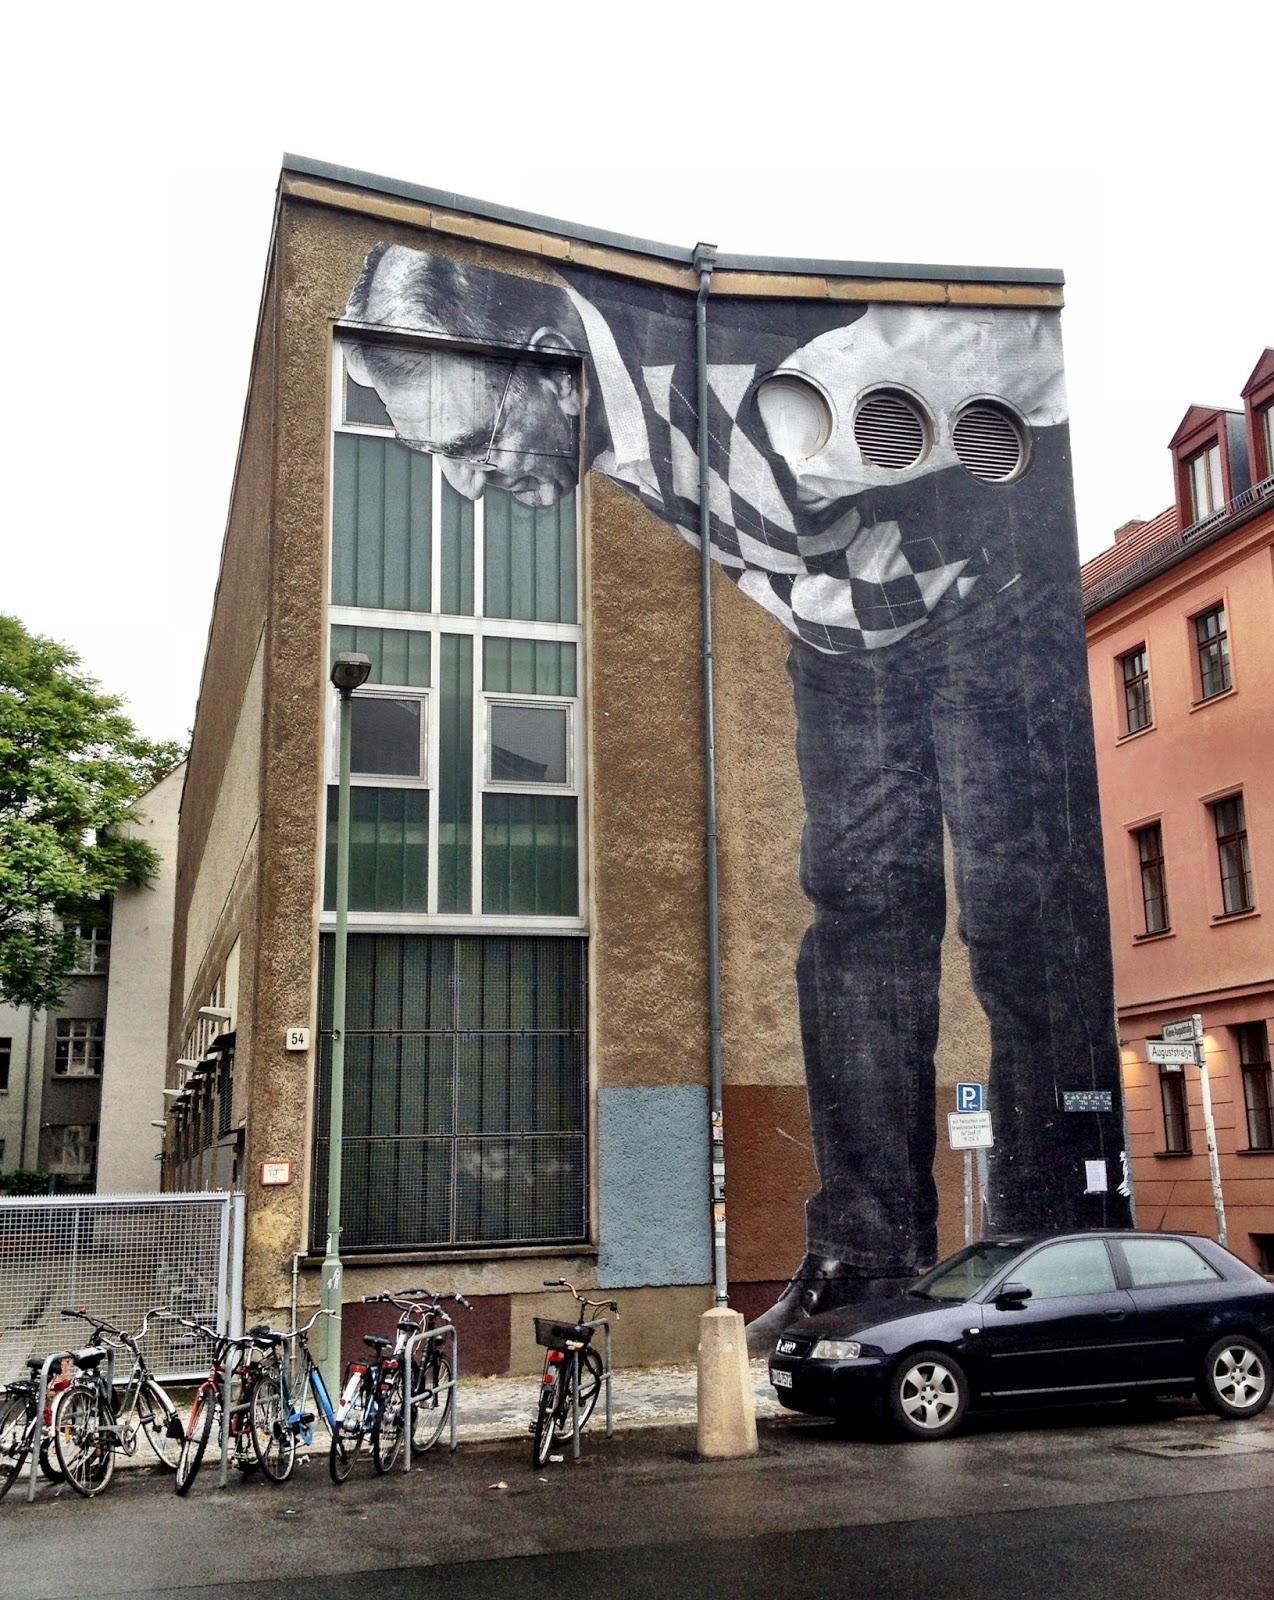 Berlin street art that necessary